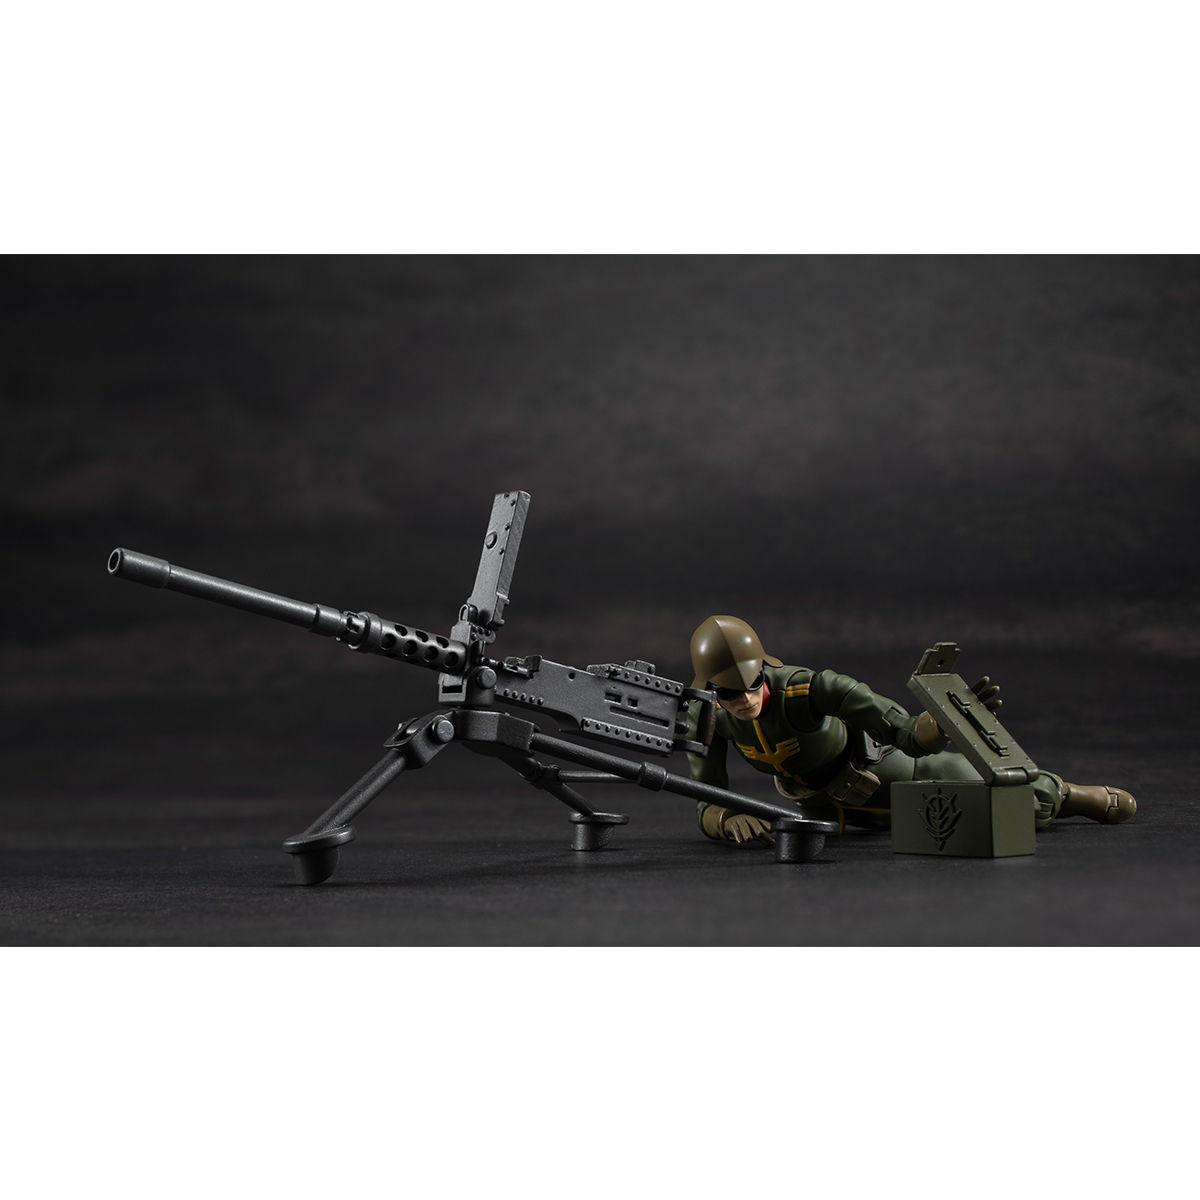 G.M.G. ガンダムミリタリージェネレーション『ジオン公国軍一般兵士01』1/18 可動フィギュア-025